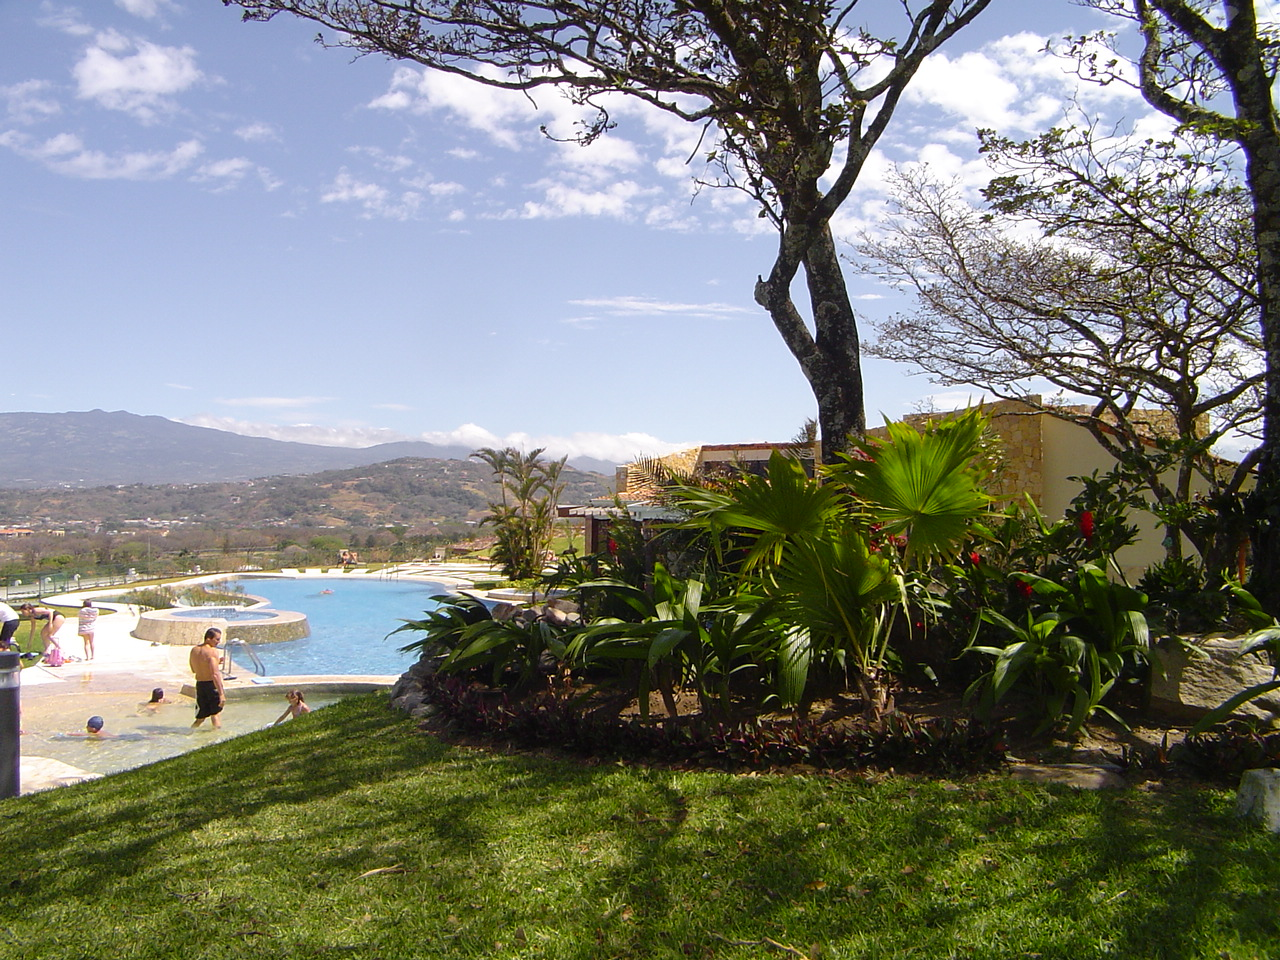 Condos for sale in Avalon Country in Santa Ana - Costa Rica